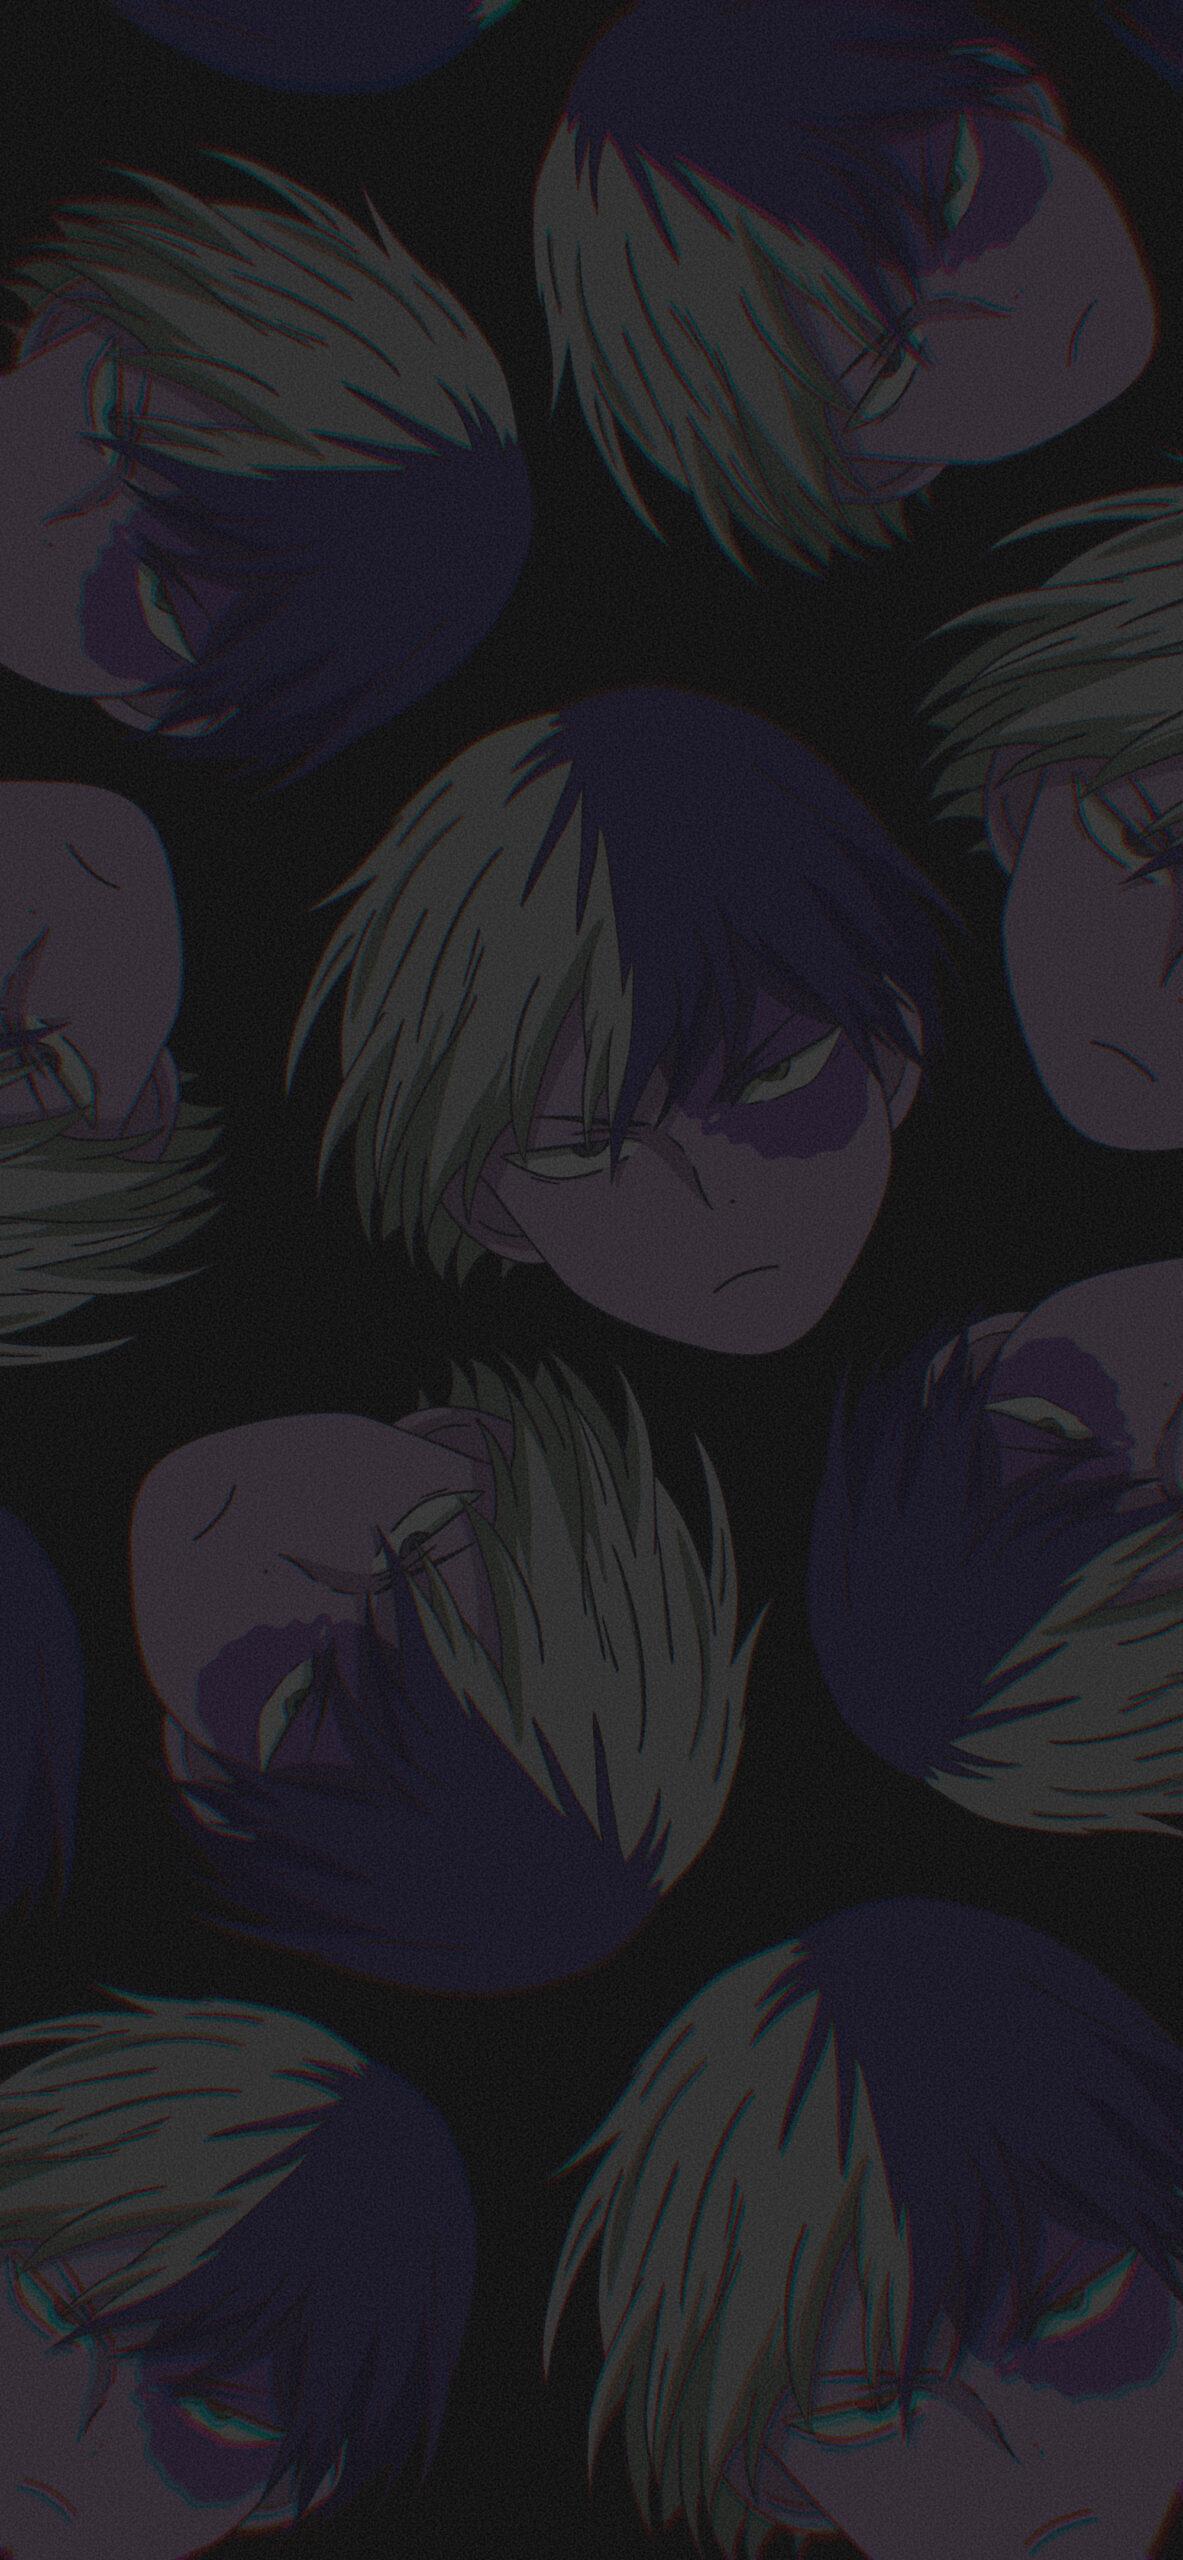 mha shoto todoroki black background 2